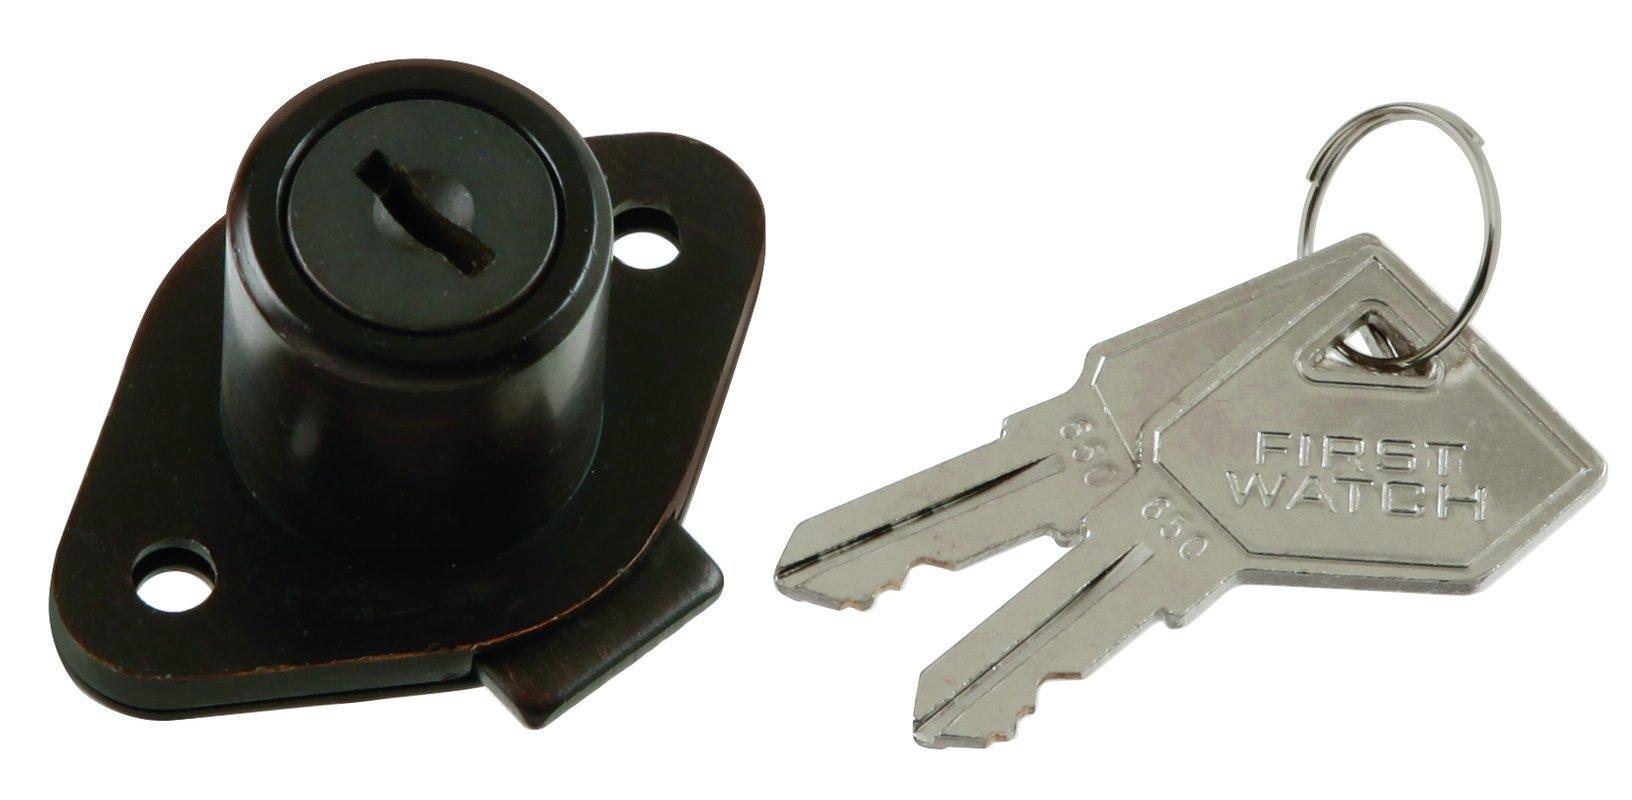 keyed alike door knobs and deadbolts photo - 6